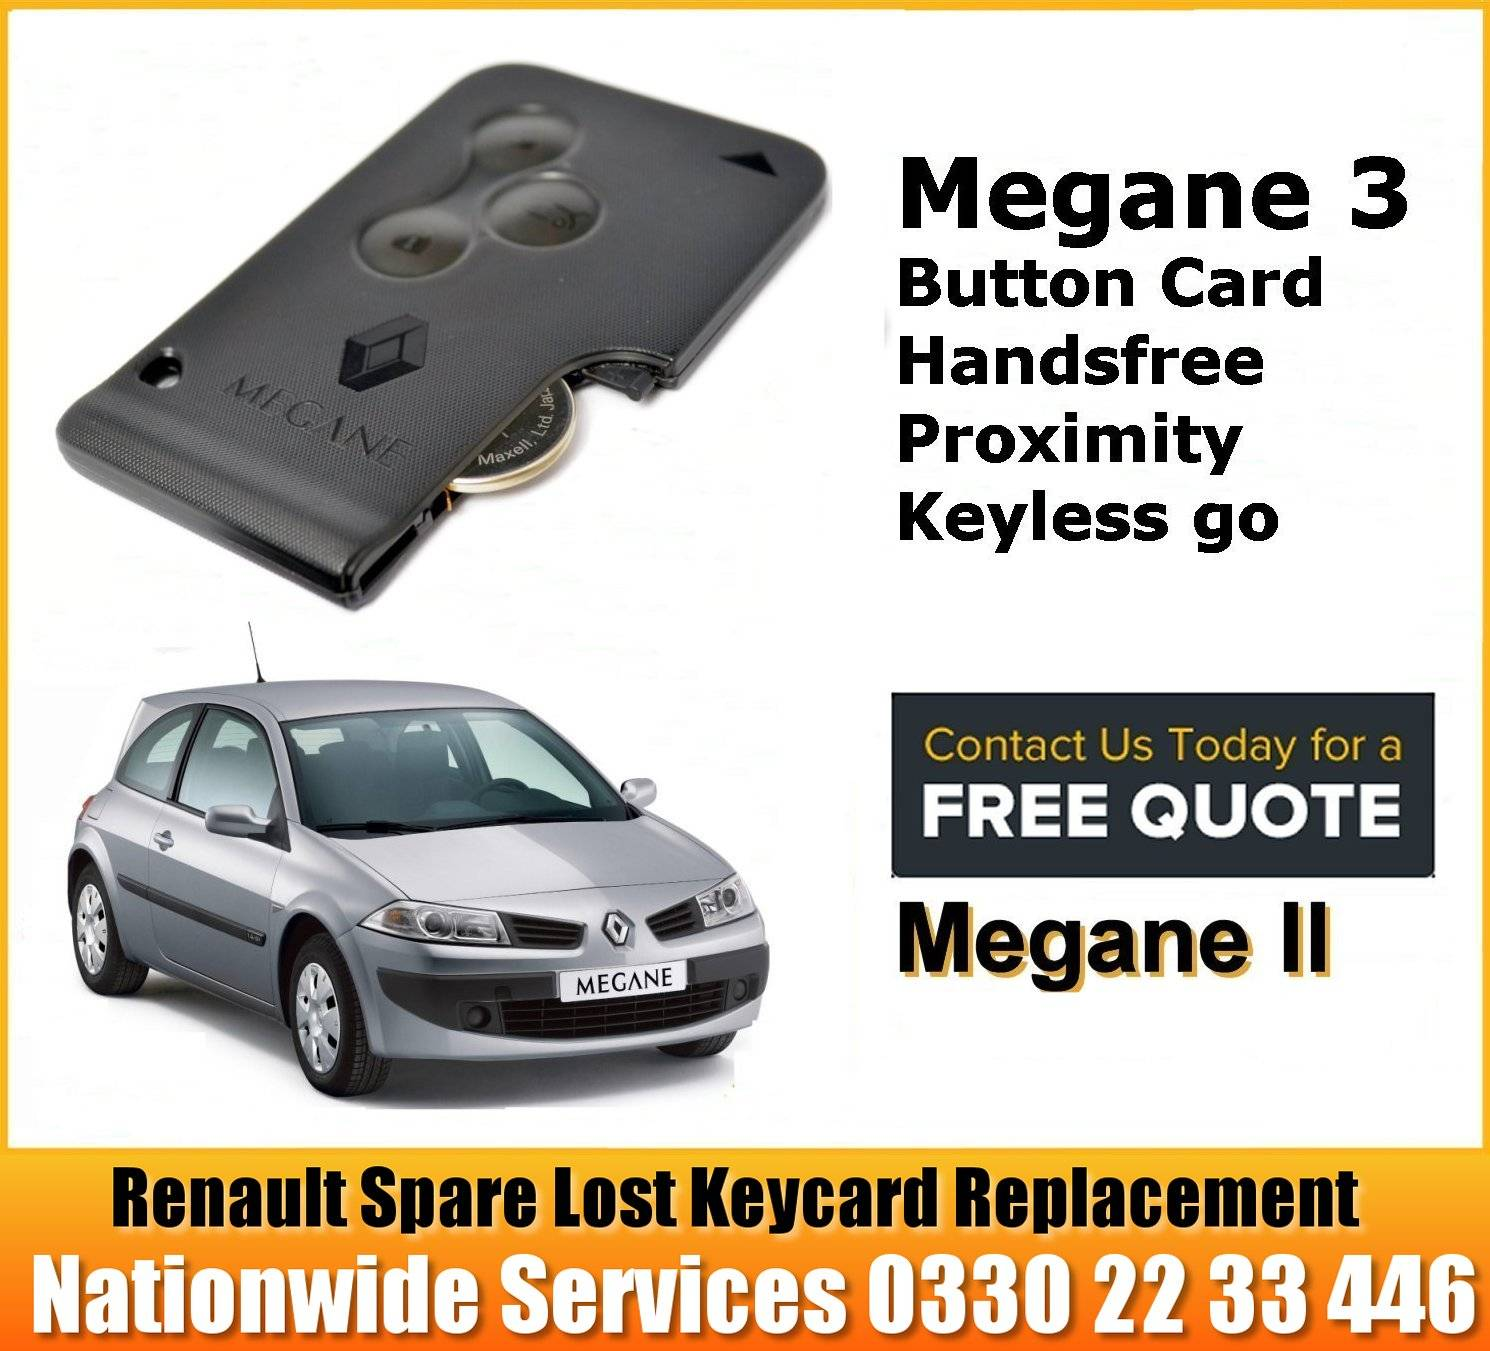 Renault Replacement Remote Key Card Bardsey Bradford Bramhope Bramley Collingham Dewsbury Kippax Methley Micklefield Morley Ossett Pudsey ScarcroftScholesShipley Stainburn Swillington Thorner Wakefield